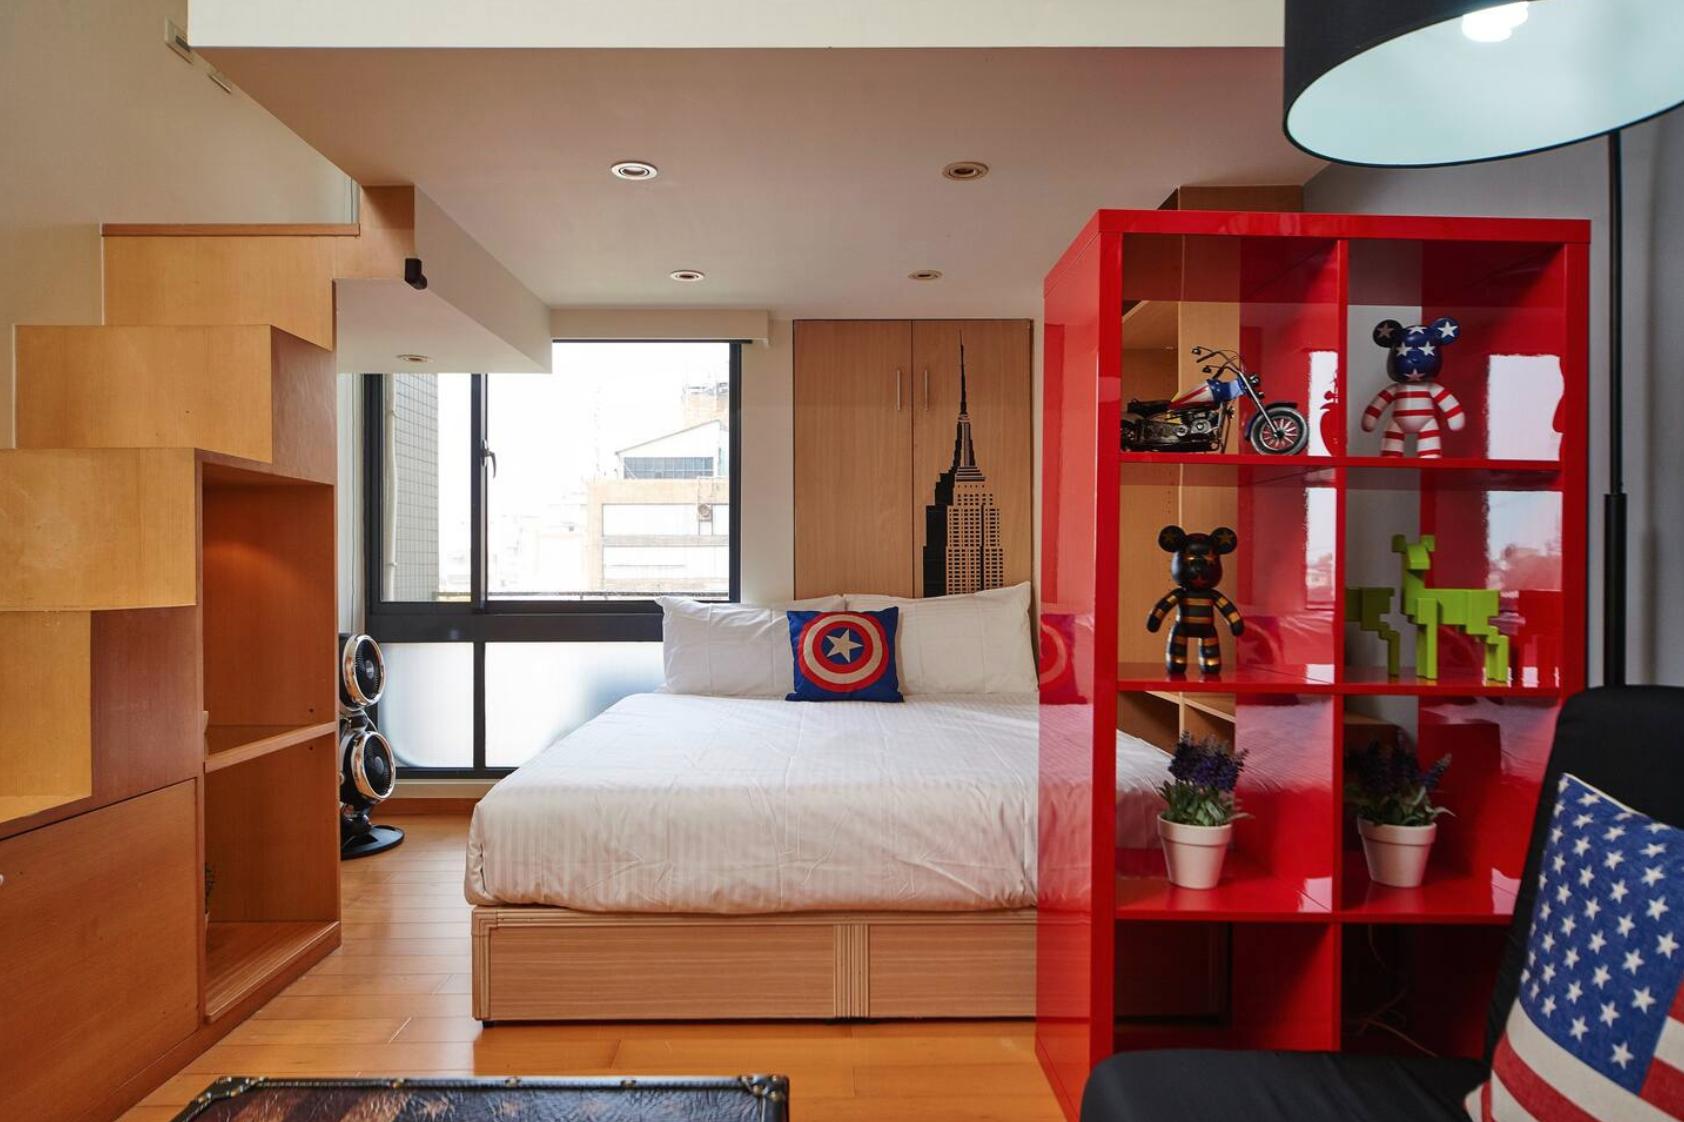 airbnb Taipei - where to stay in Taipei, Taiwan